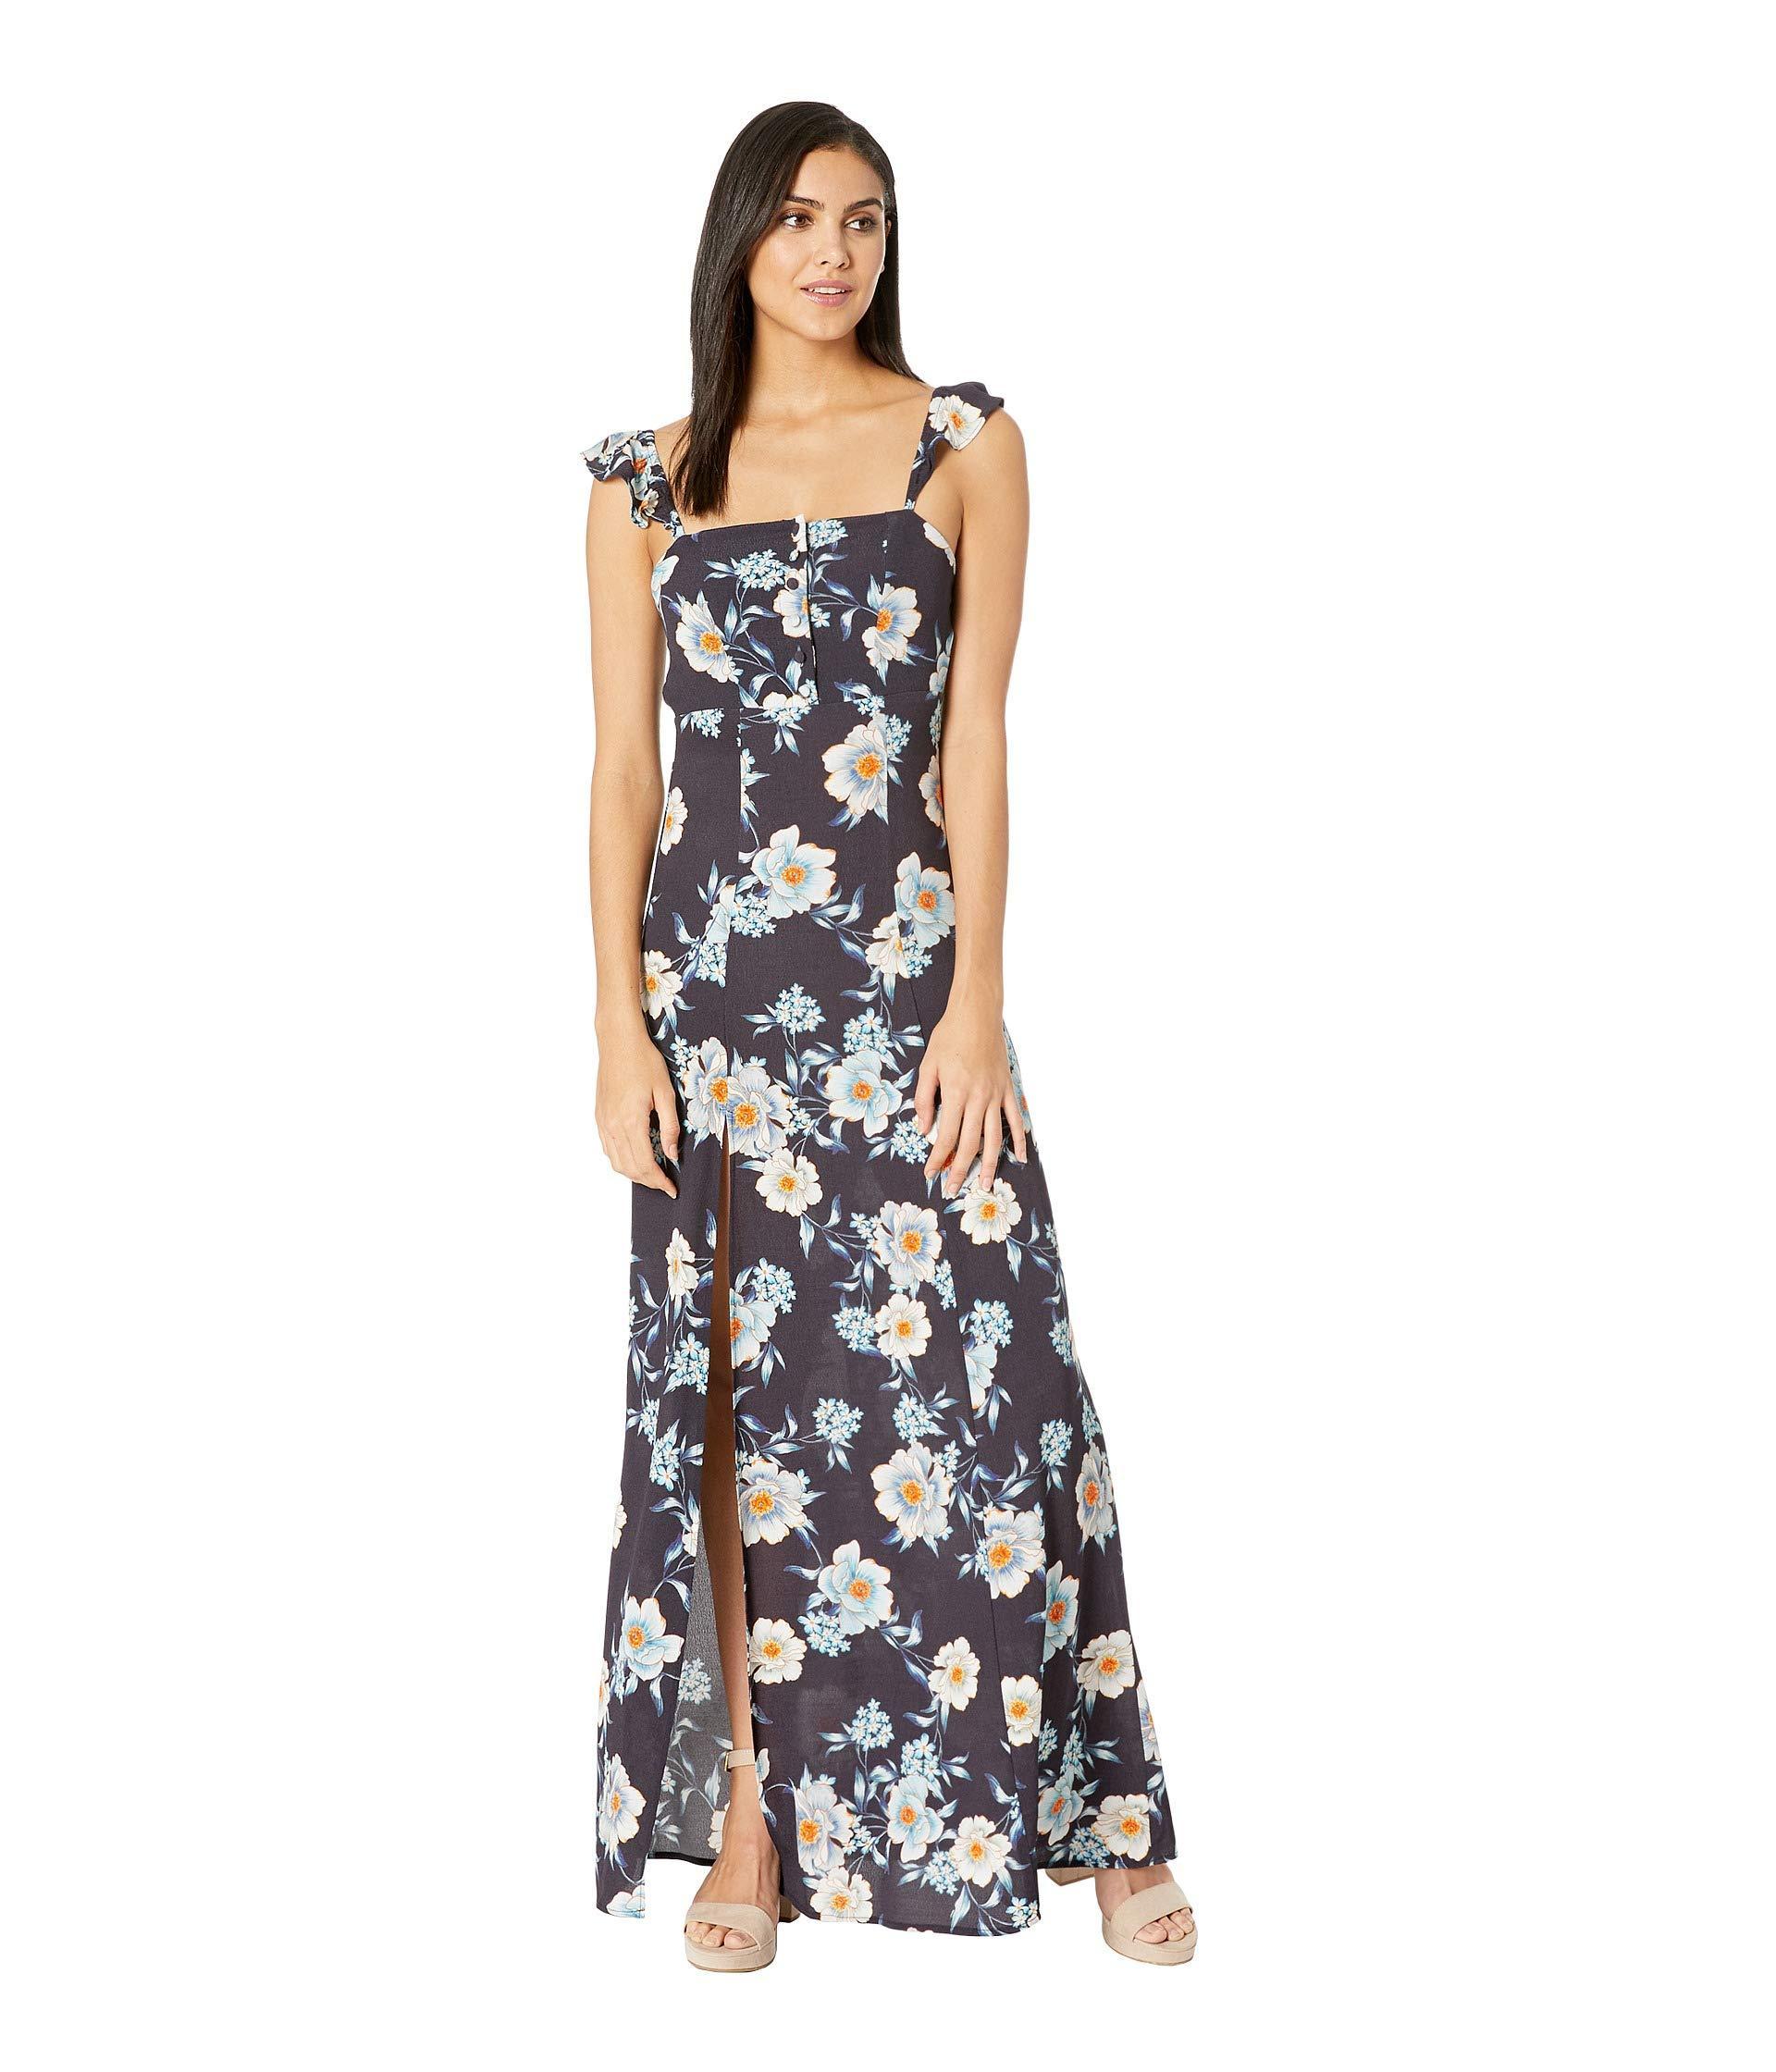 09bb63d2432 Lyst - Flynn Skye Bardot Maxi Dress in Blue